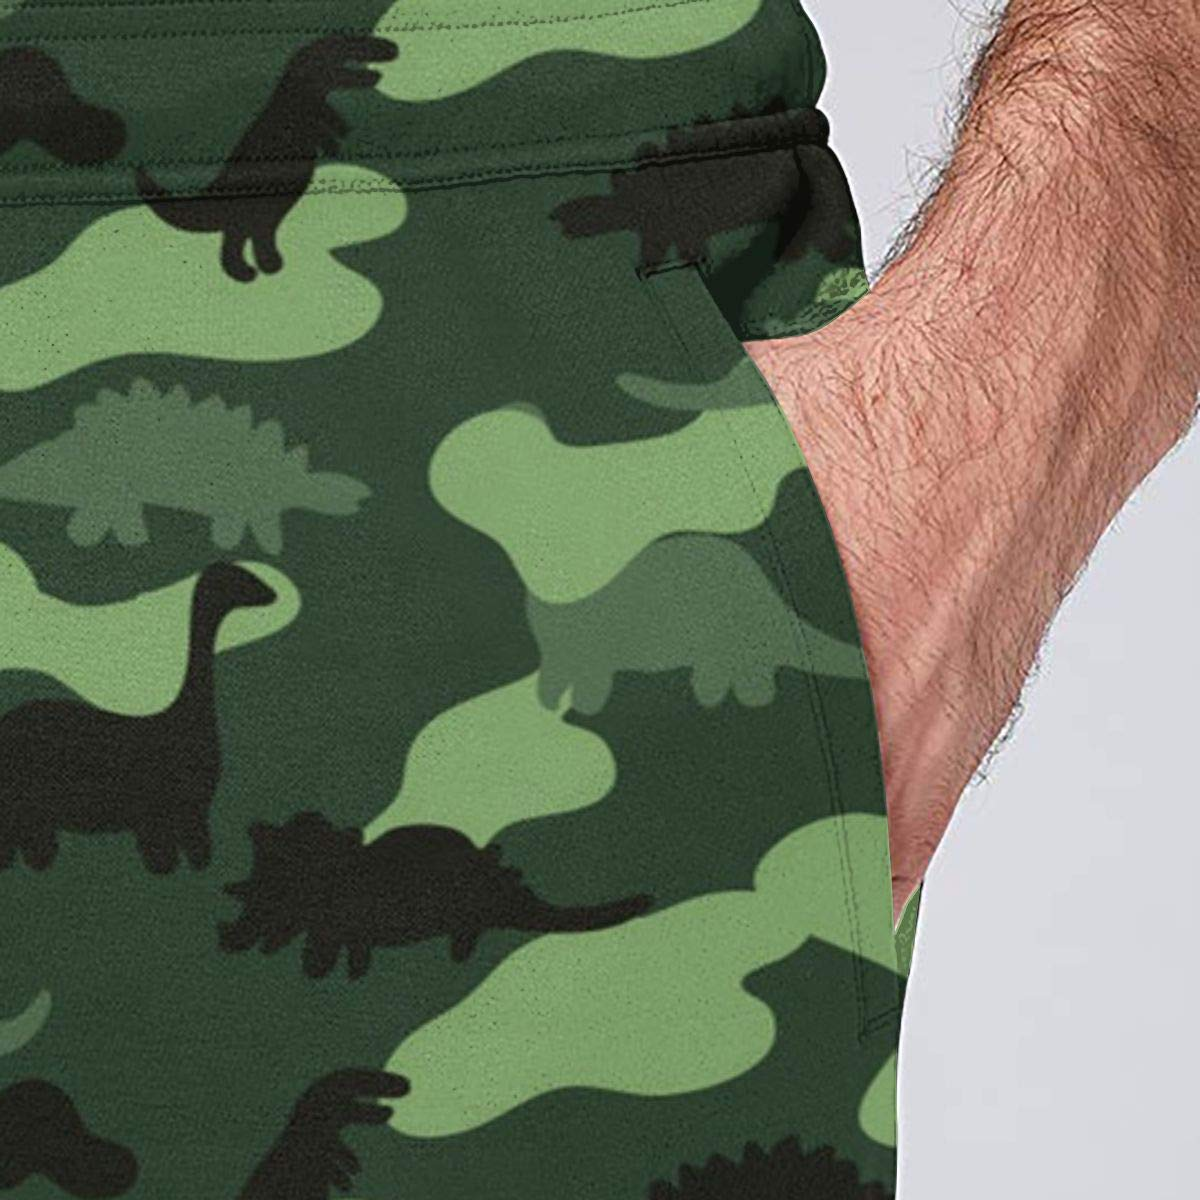 Panib Men Quick Dry Joggers Sweatpants Shadow of Dinosaur Sweatpants with Size S-3XL